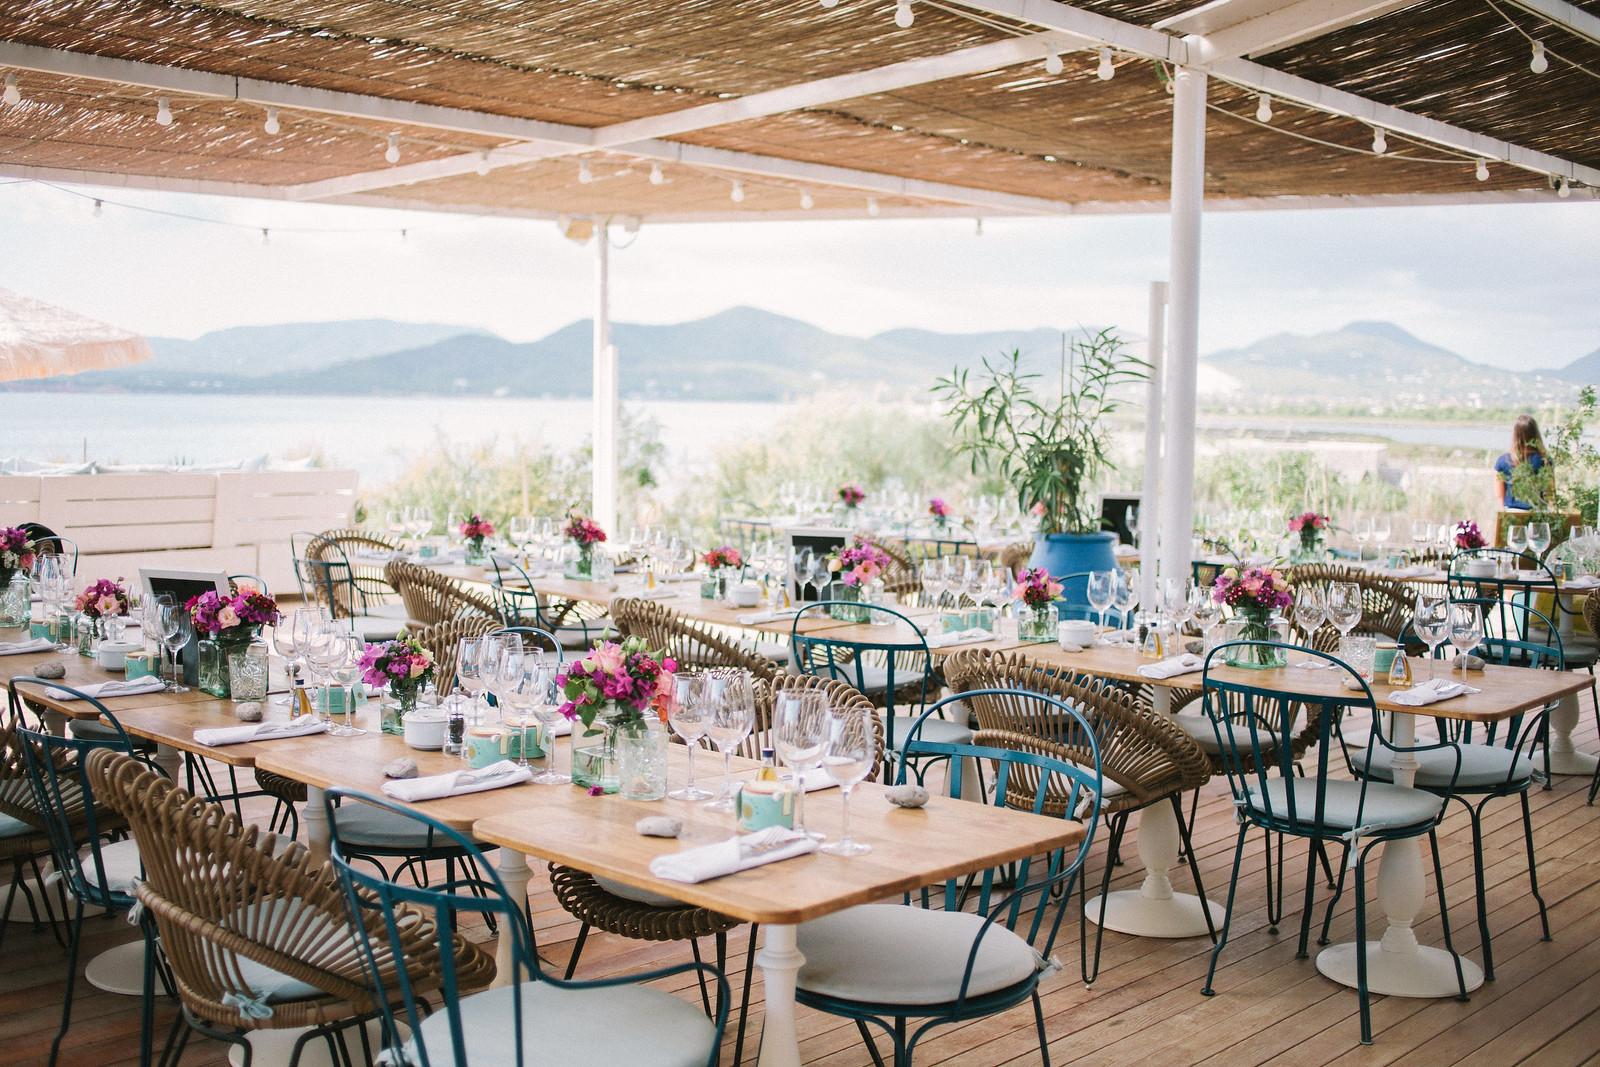 https://www.white-ibiza.com/wp-content/uploads/2020/03/white-ibiza-wedding-experimental-beach-club-2020-01.jpg